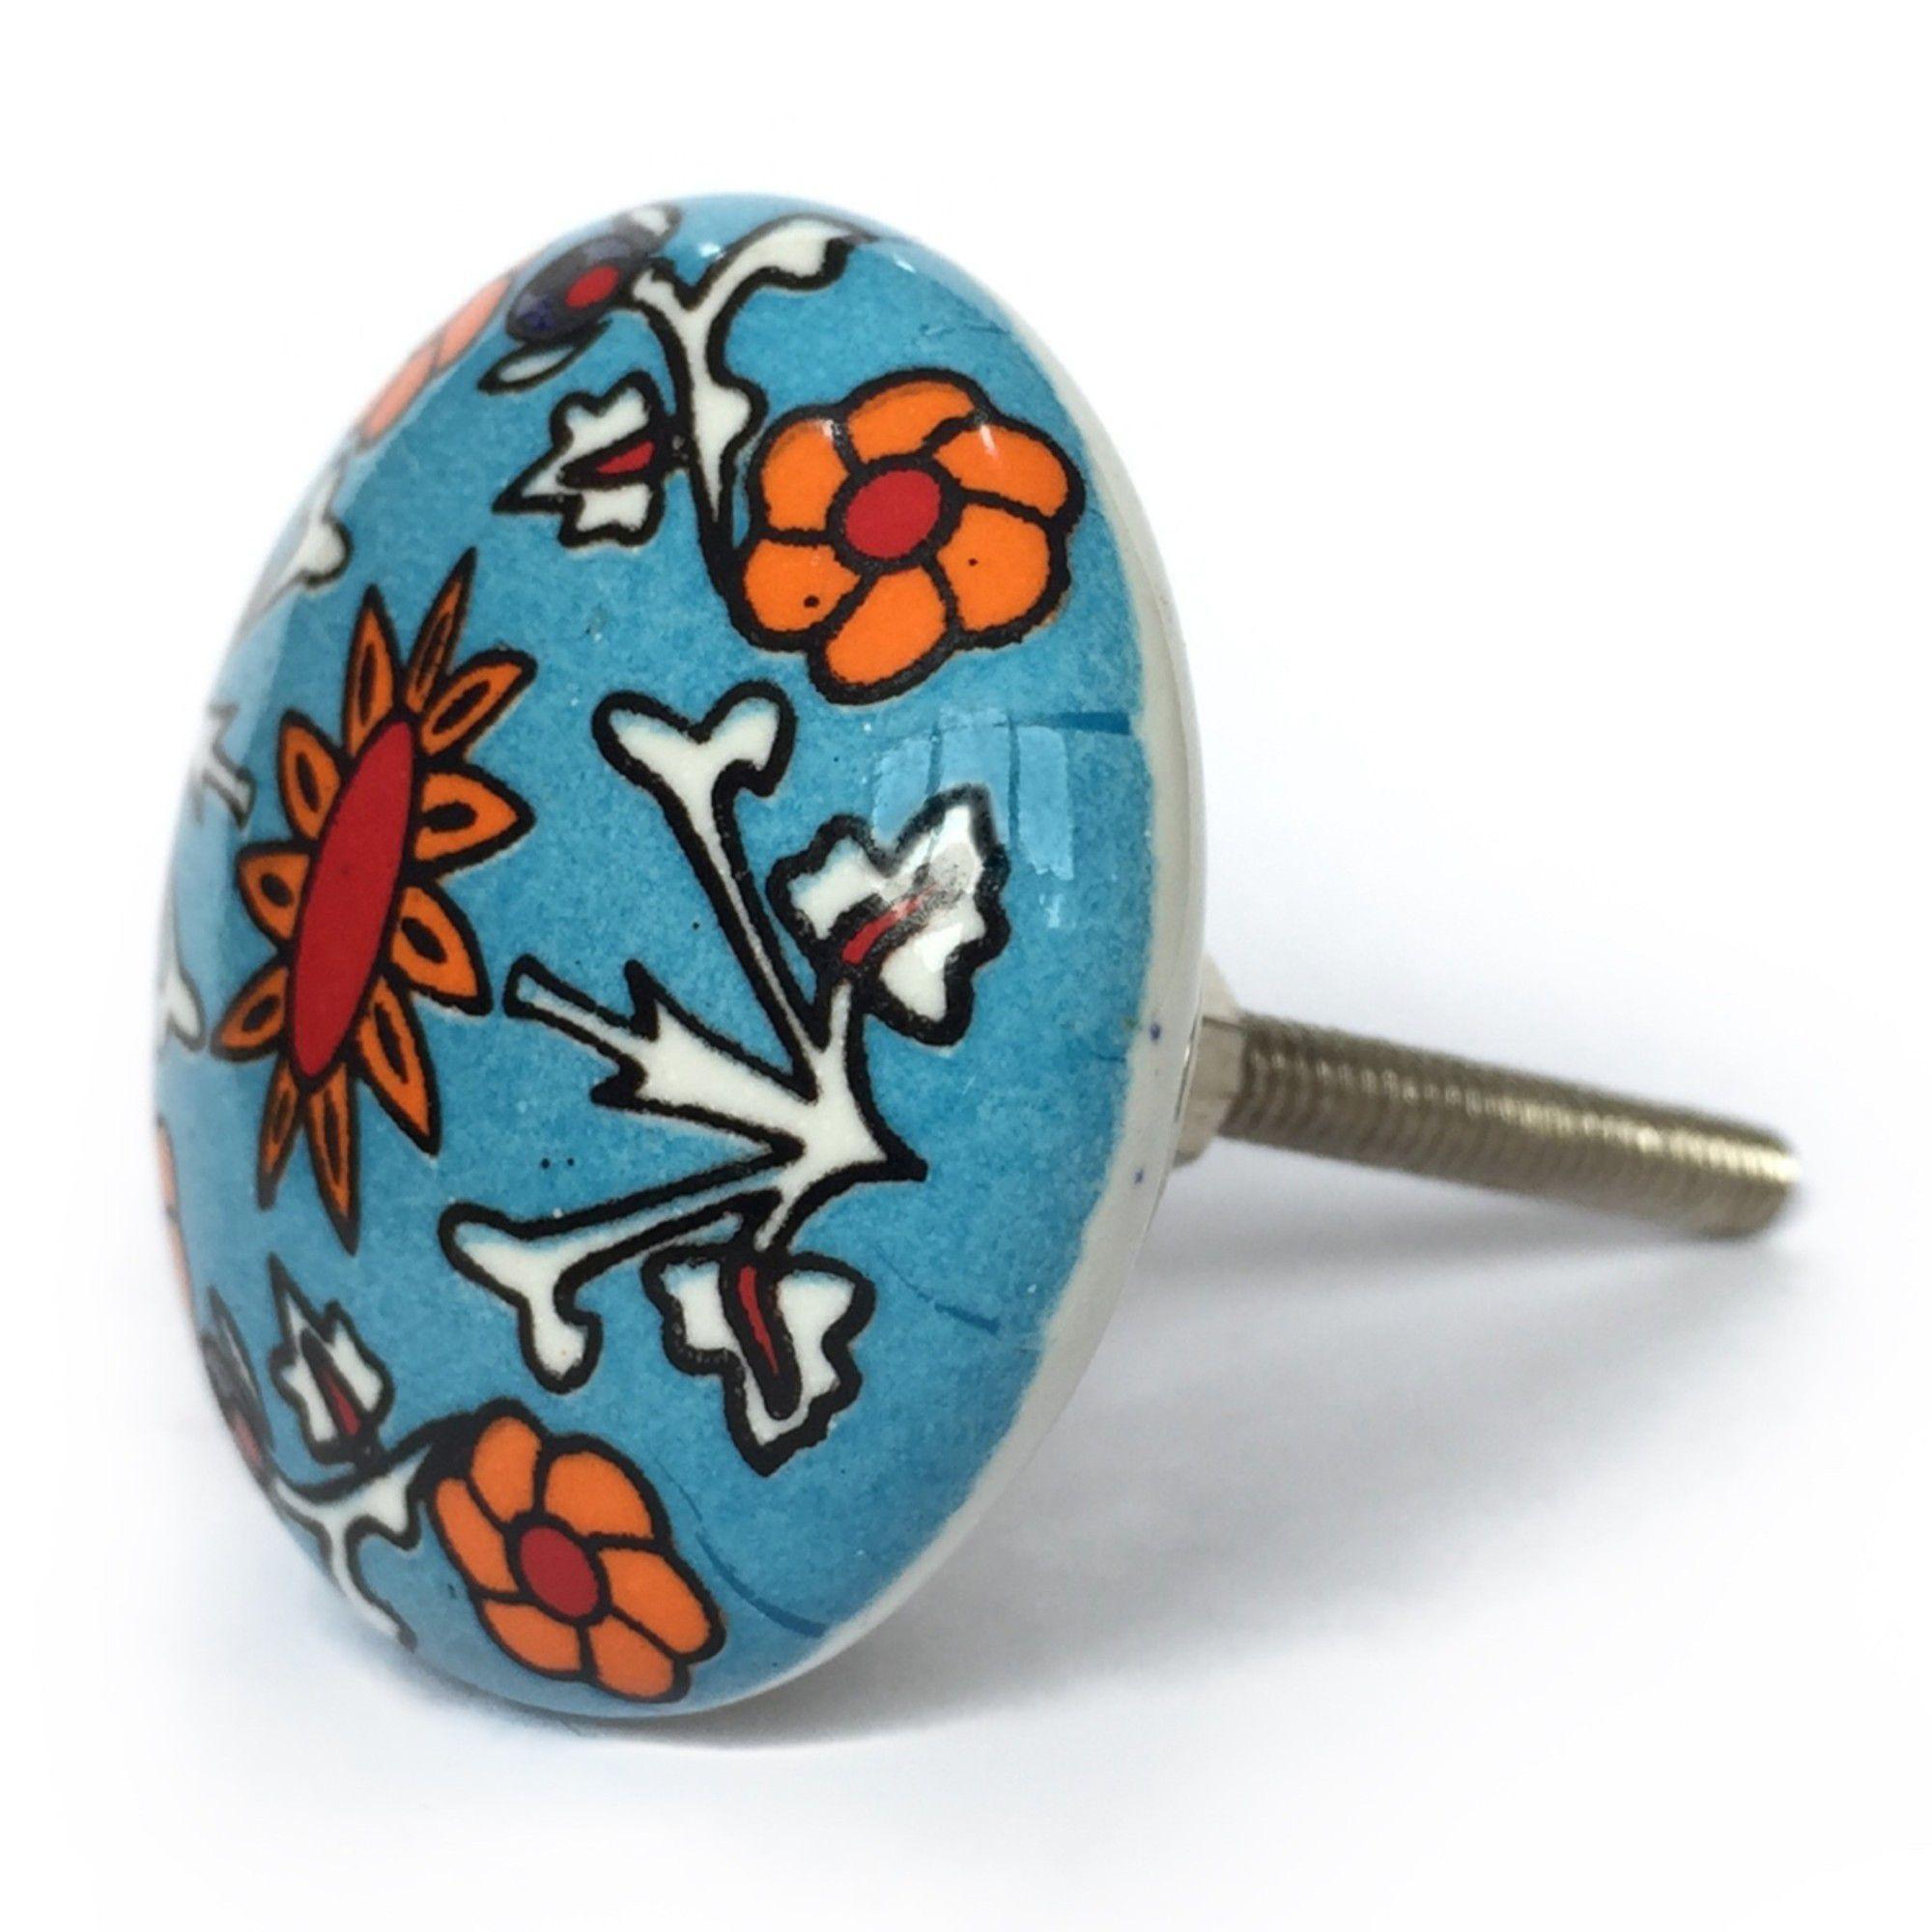 Puxador de Porcelana Decorada Primavera